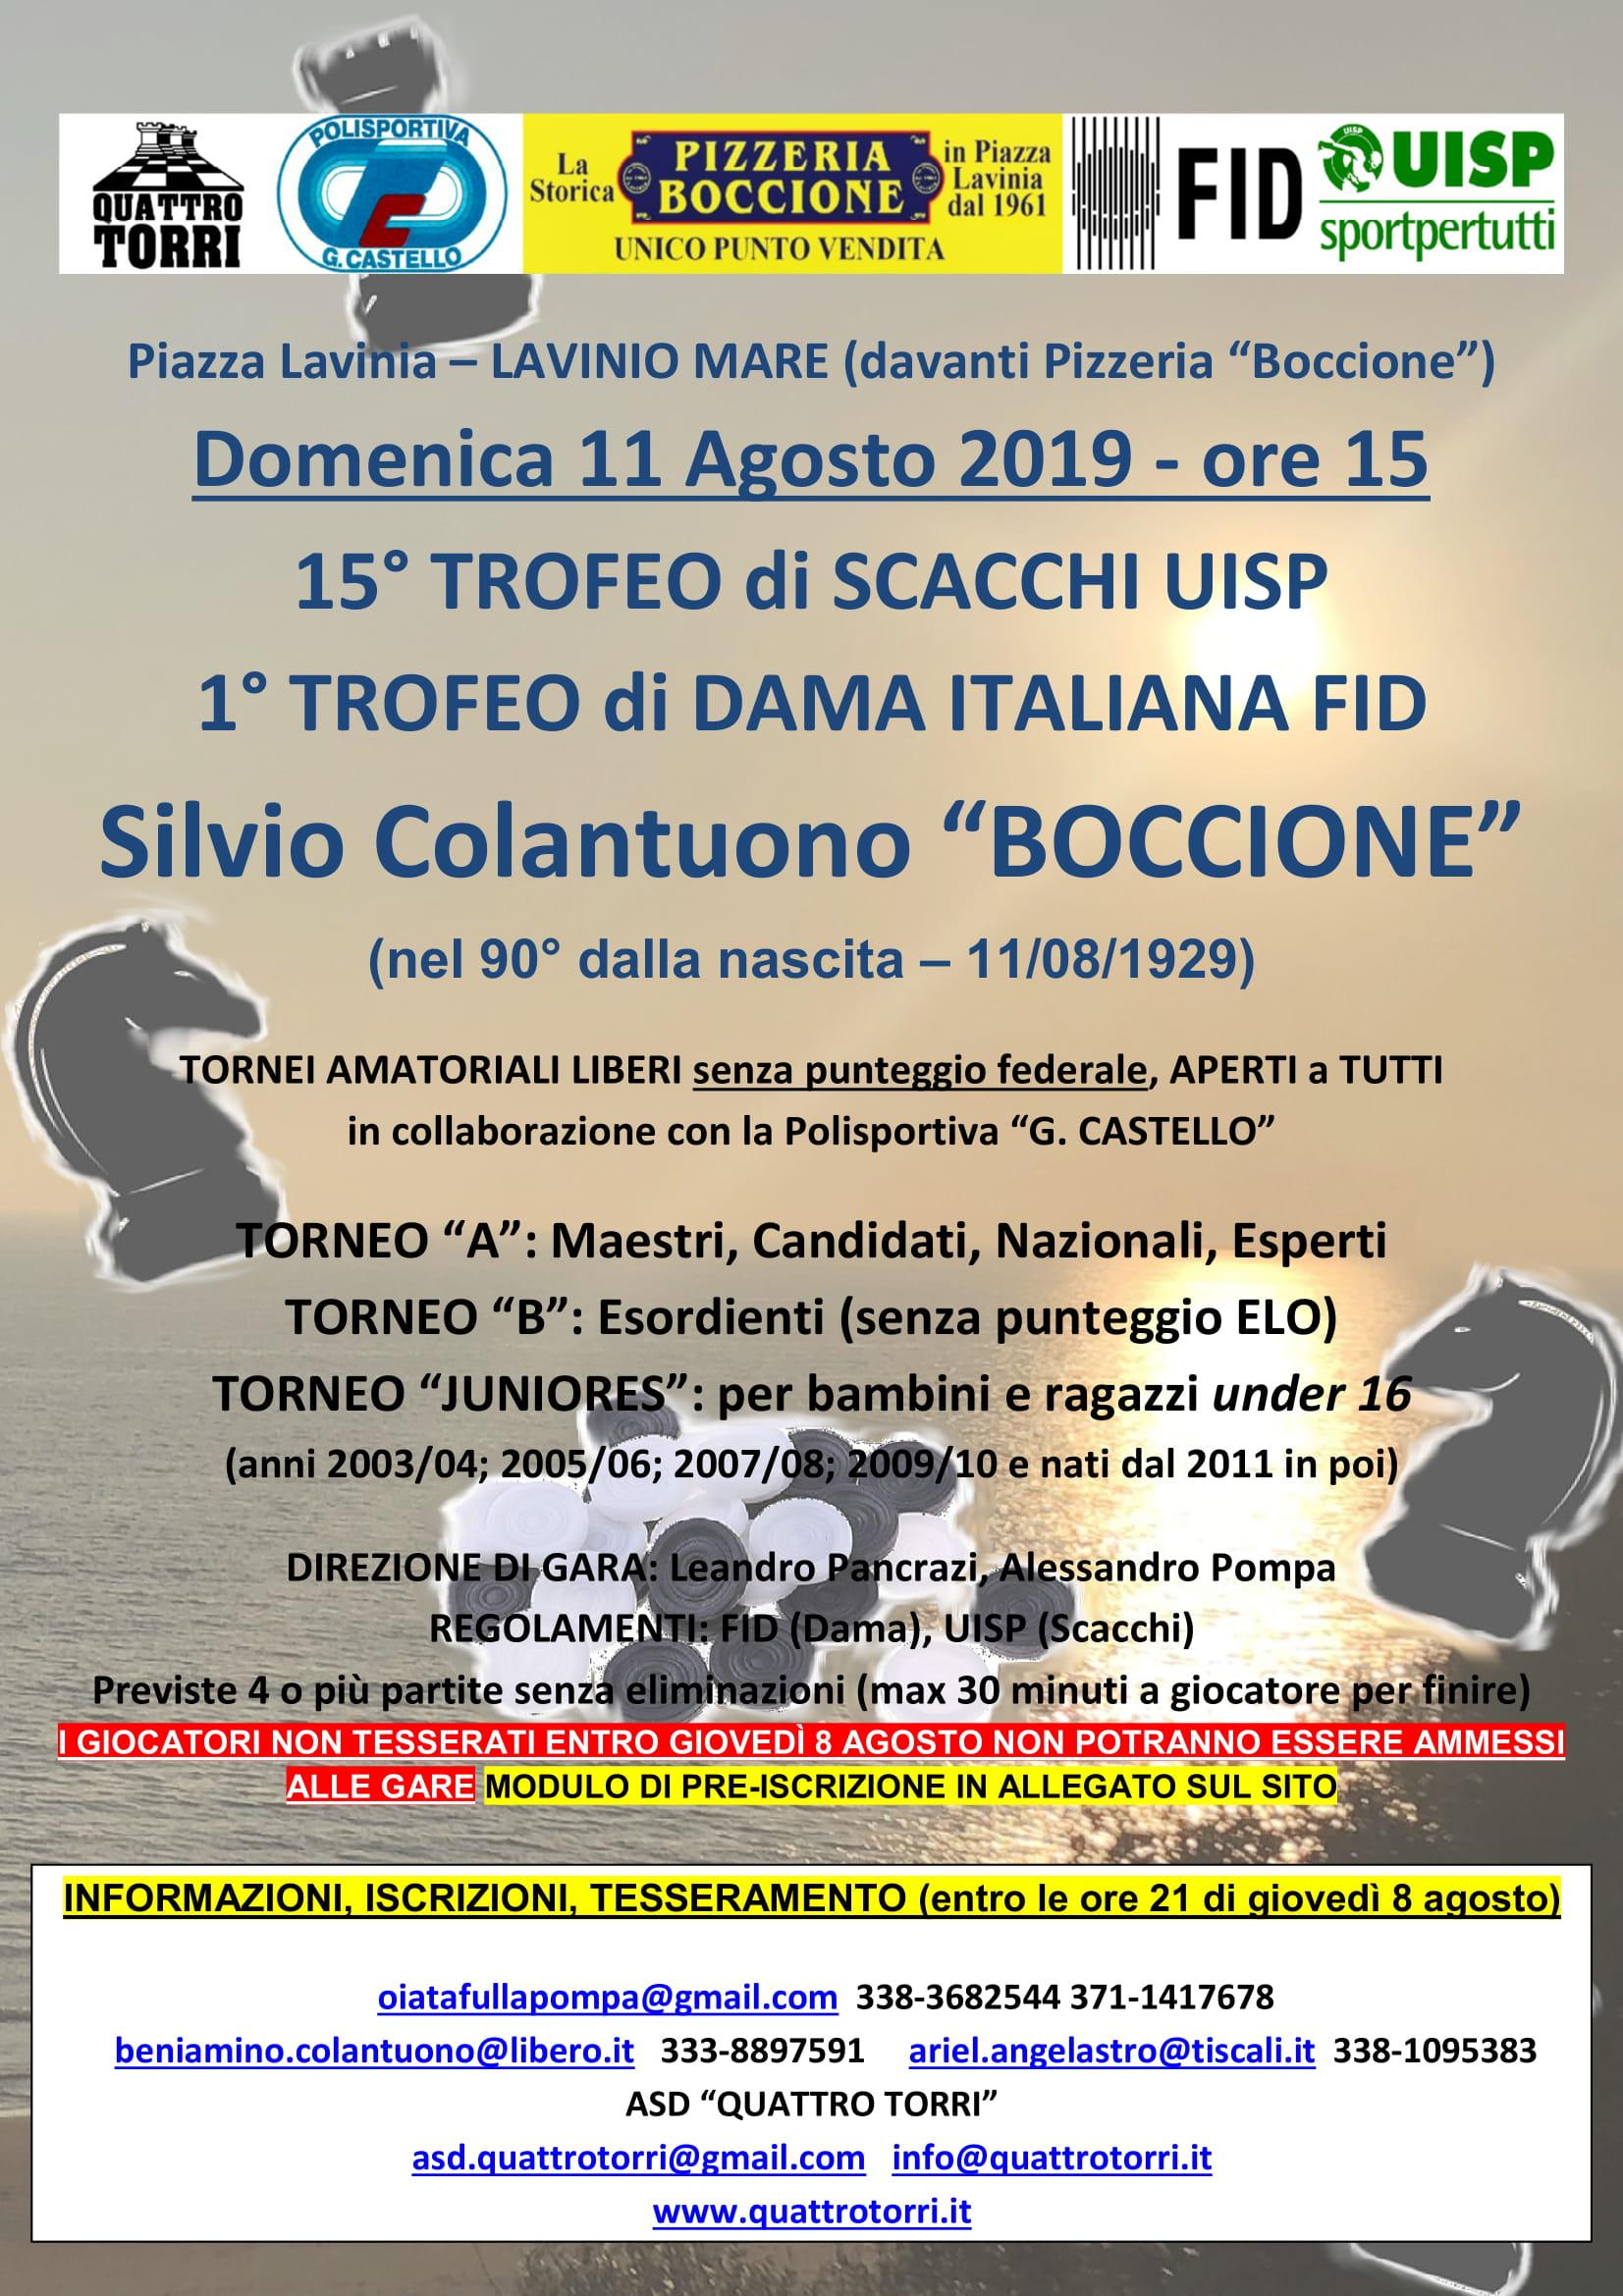 Fsi Scacchi Calendario.Asd Quattro Torri Pol G Castello Tornei